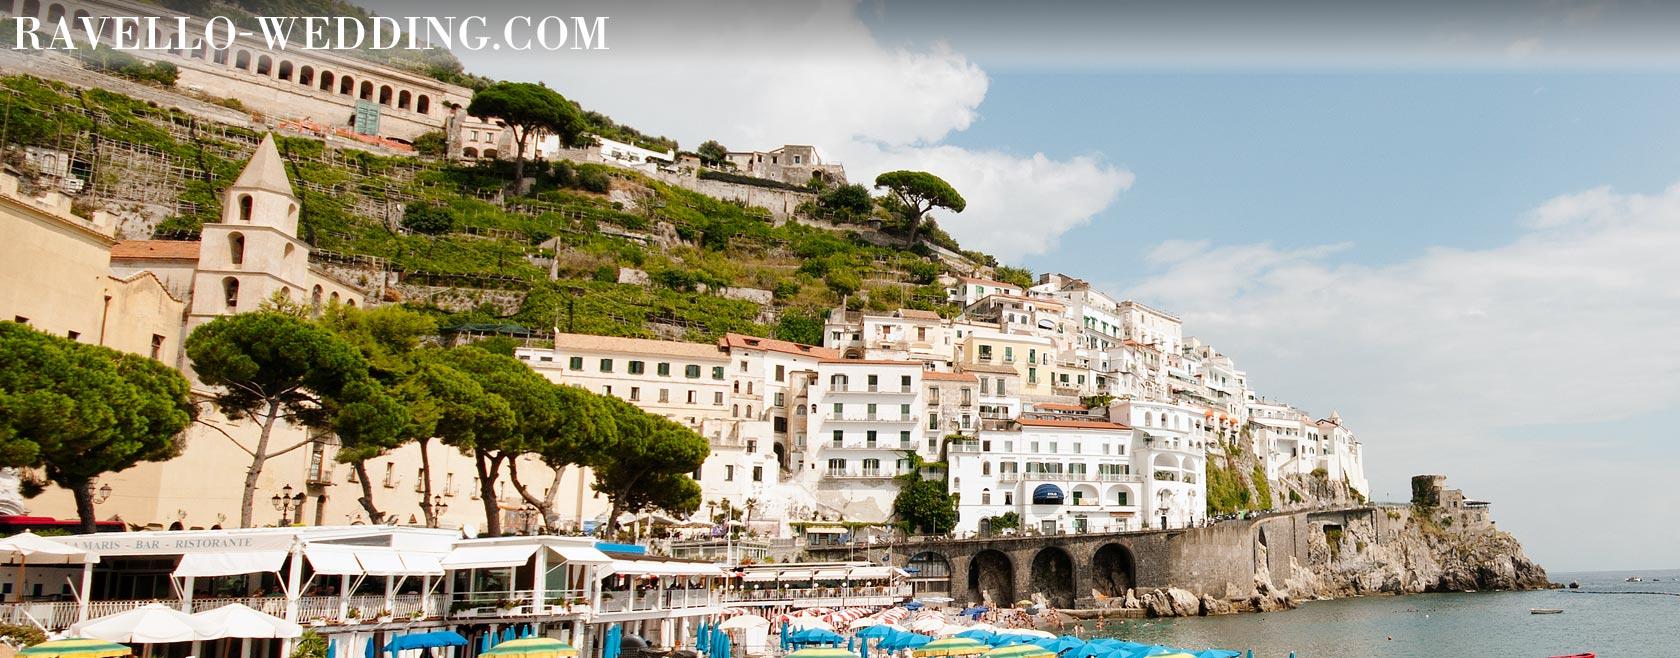 Ravello Amalfi Positano Sorrento Capri